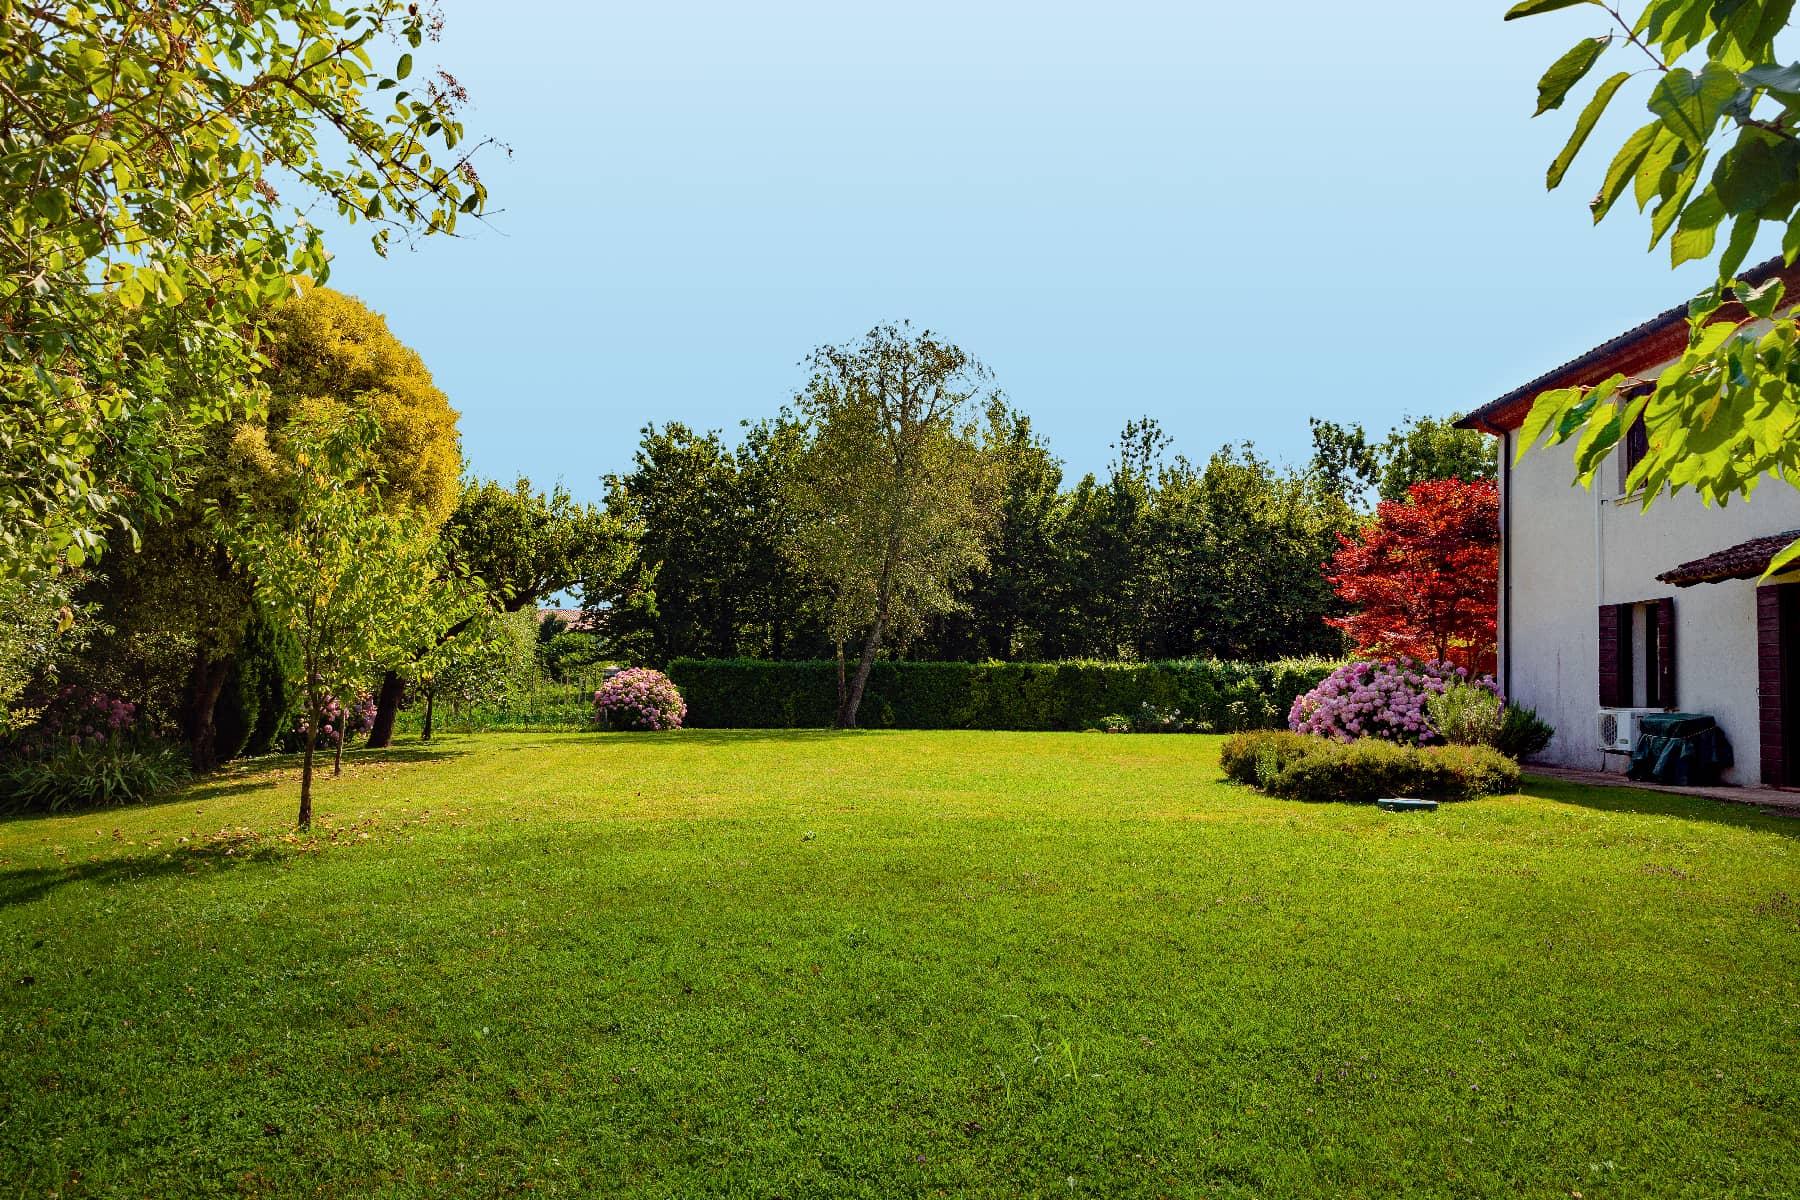 Villa in Vendita a Carbonera: 5 locali, 850 mq - Foto 21